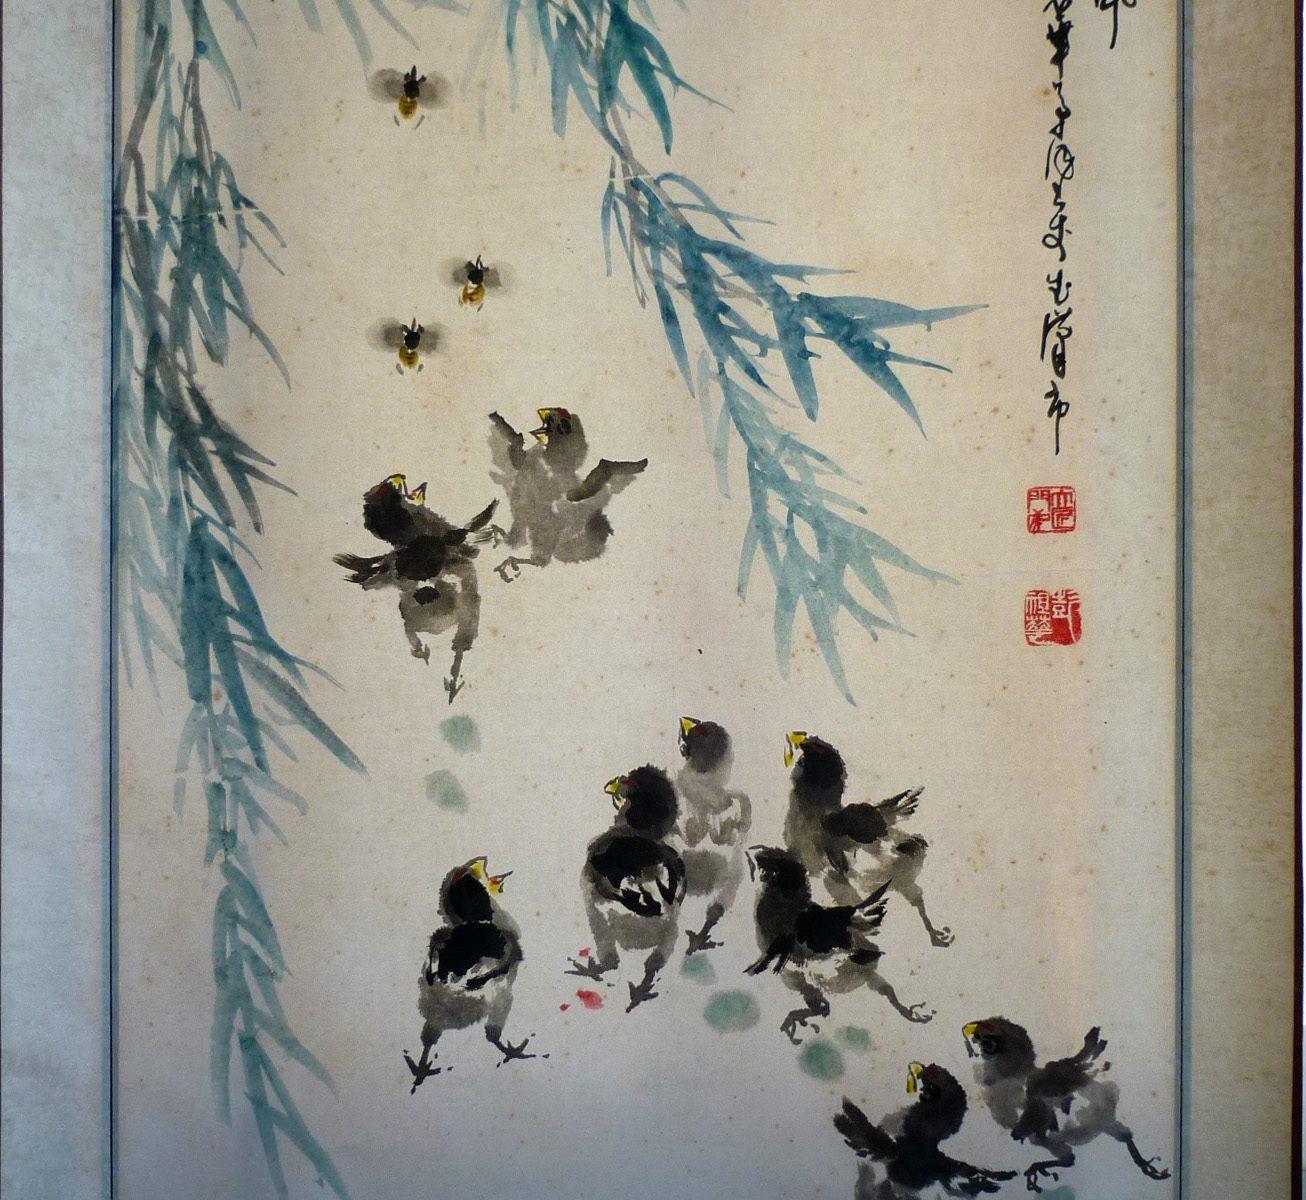 OZmarkets, Spring Day - Peng Zuhua. 春和日丽 - 彭祖华